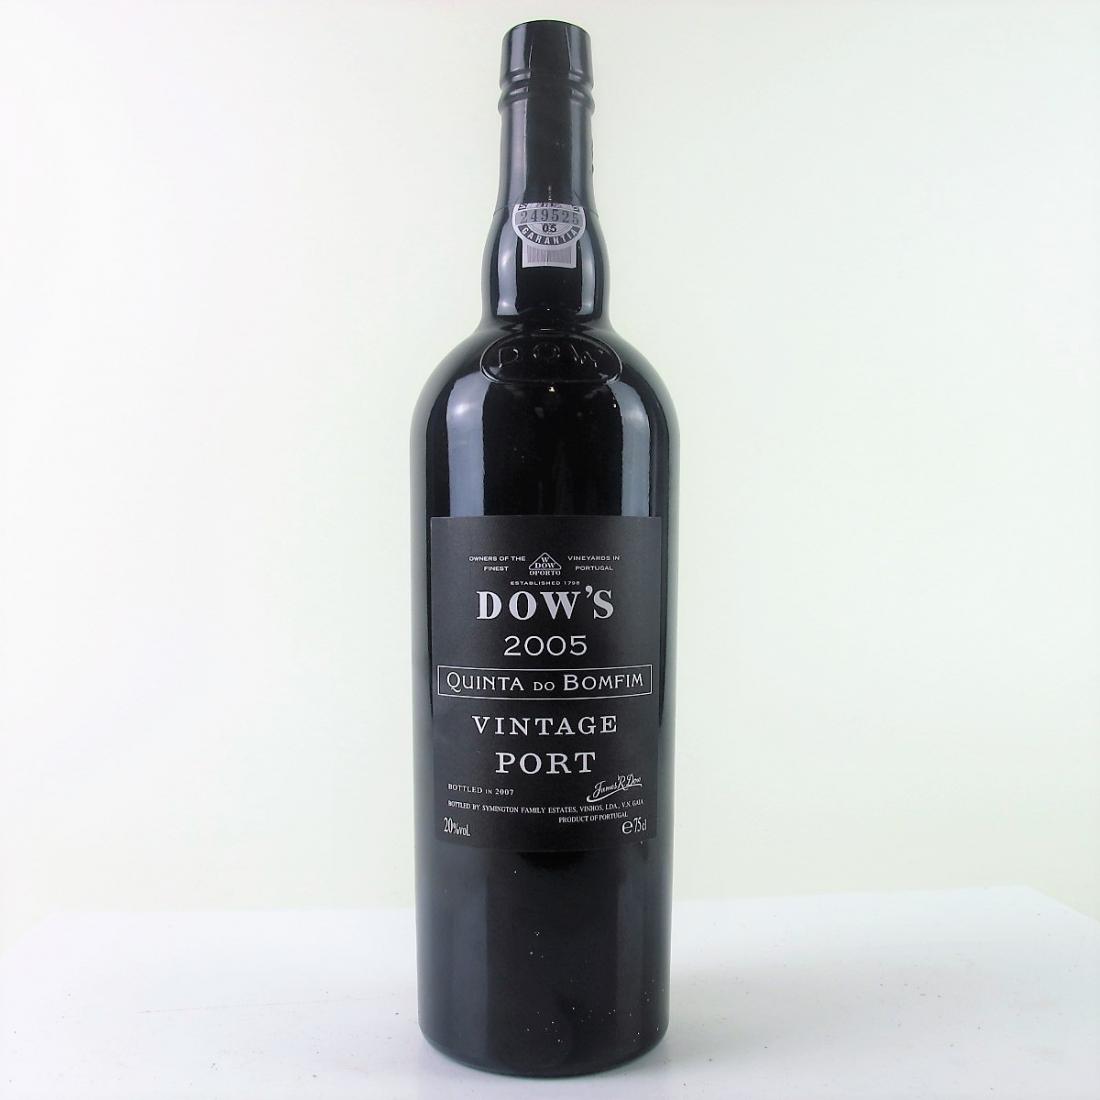 Dow's Quinta Do Bomfim 2005 Vintage Port